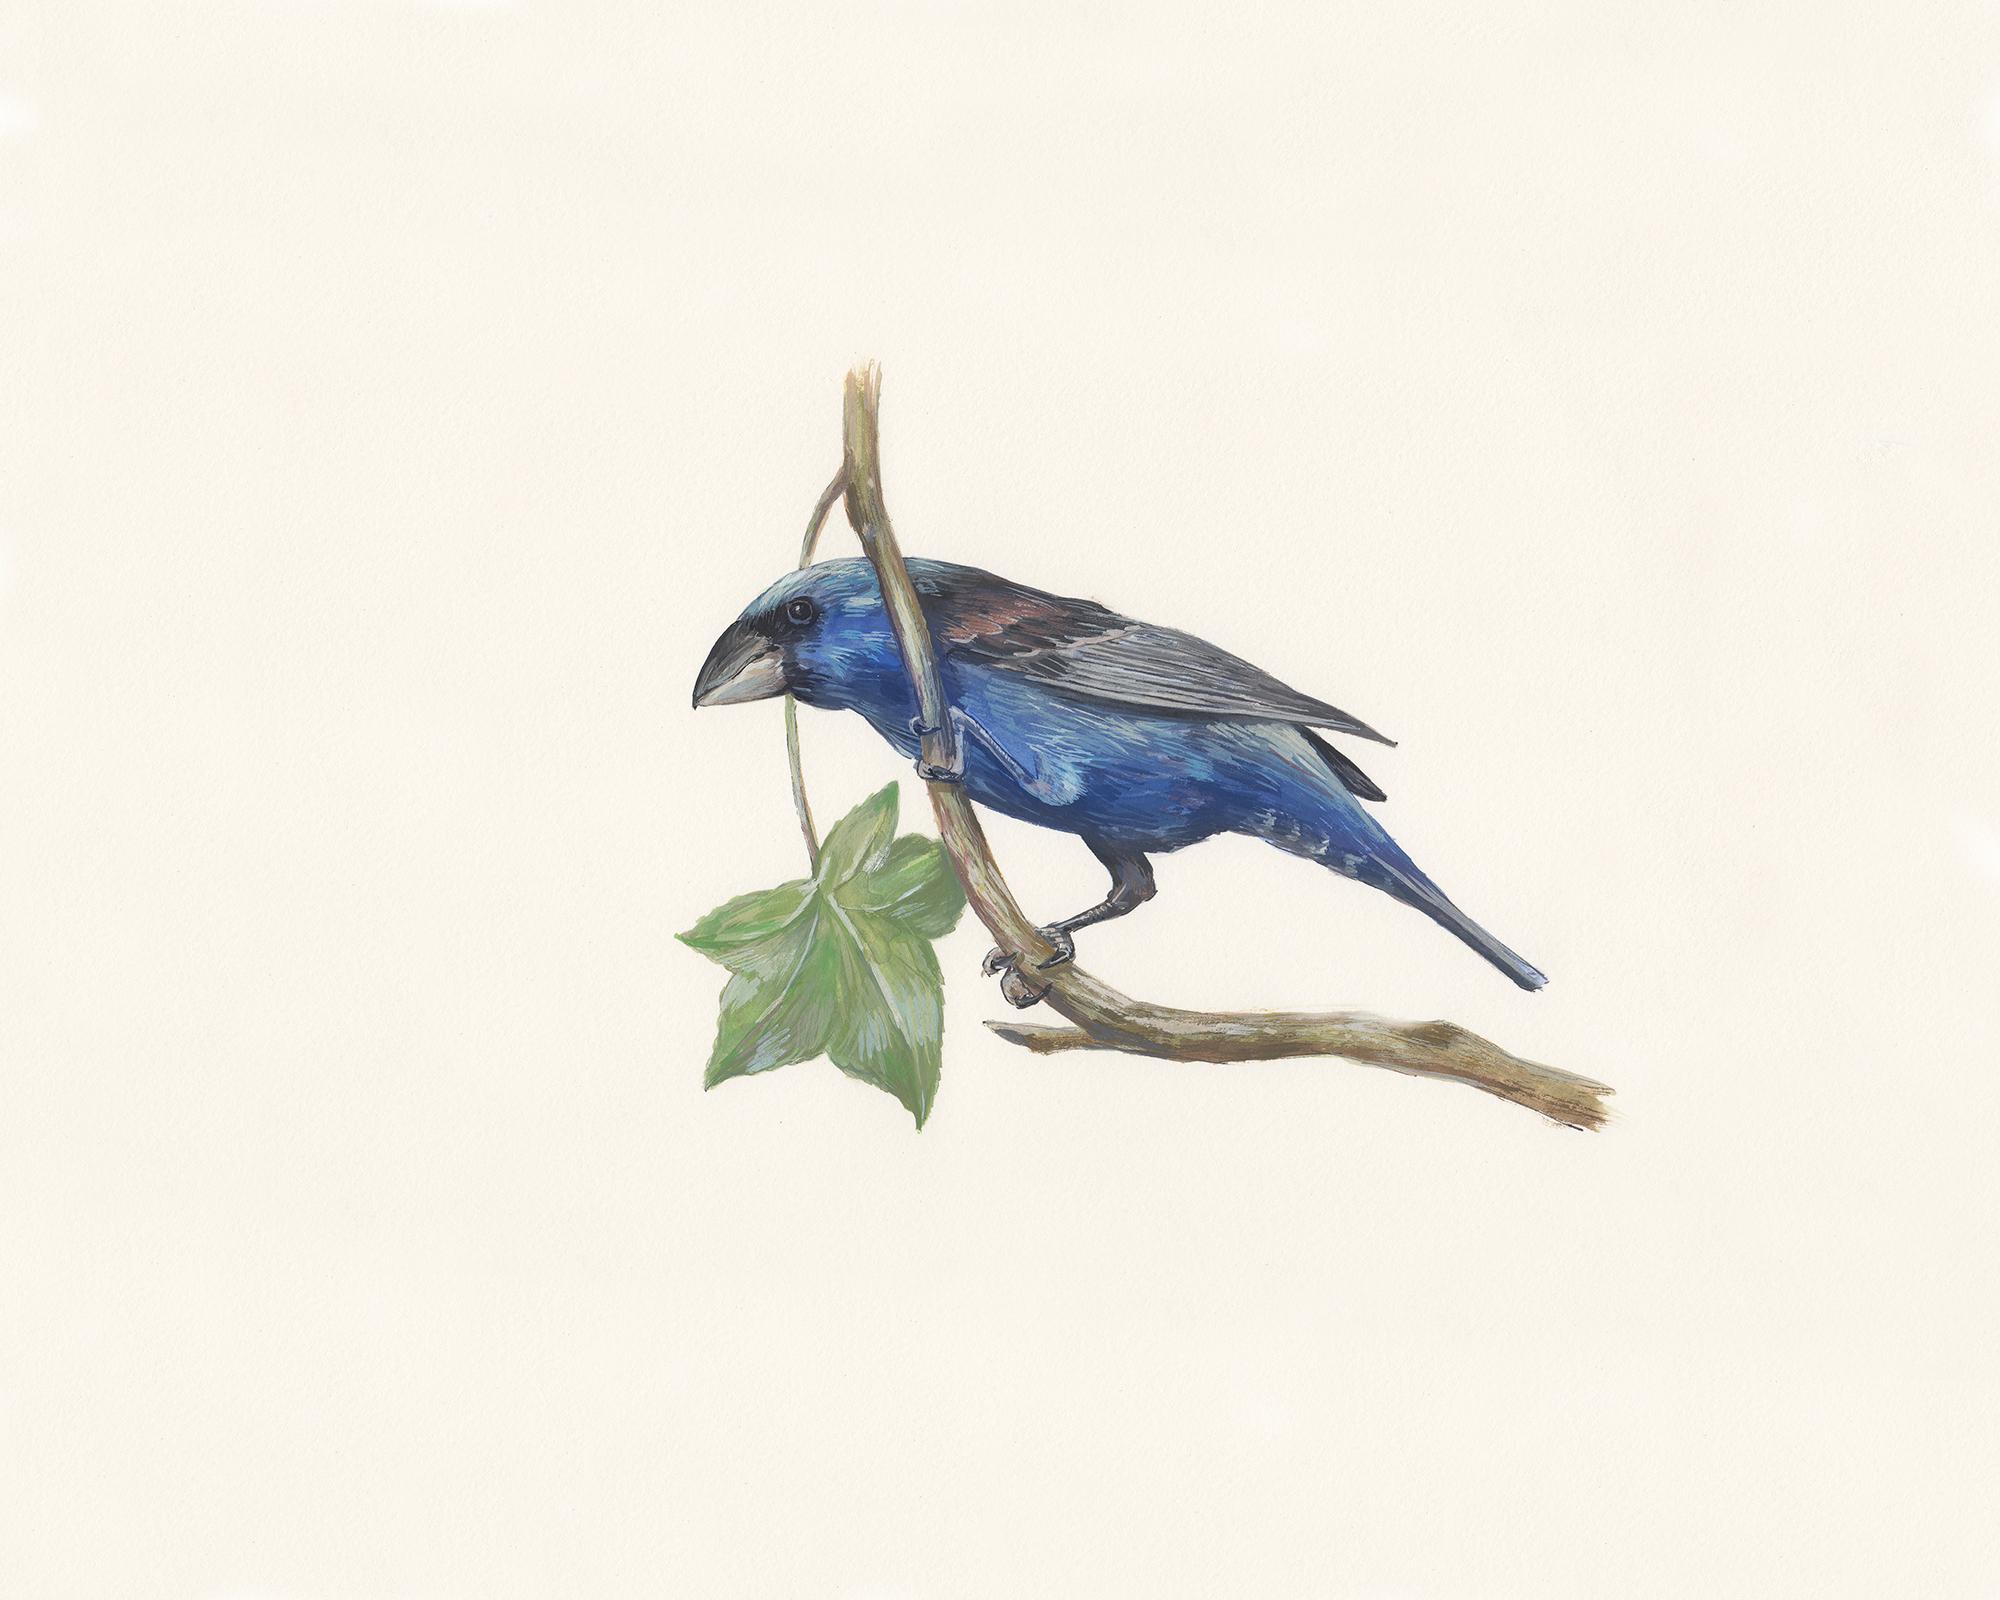 Blue grosbeak. Guache on paper.